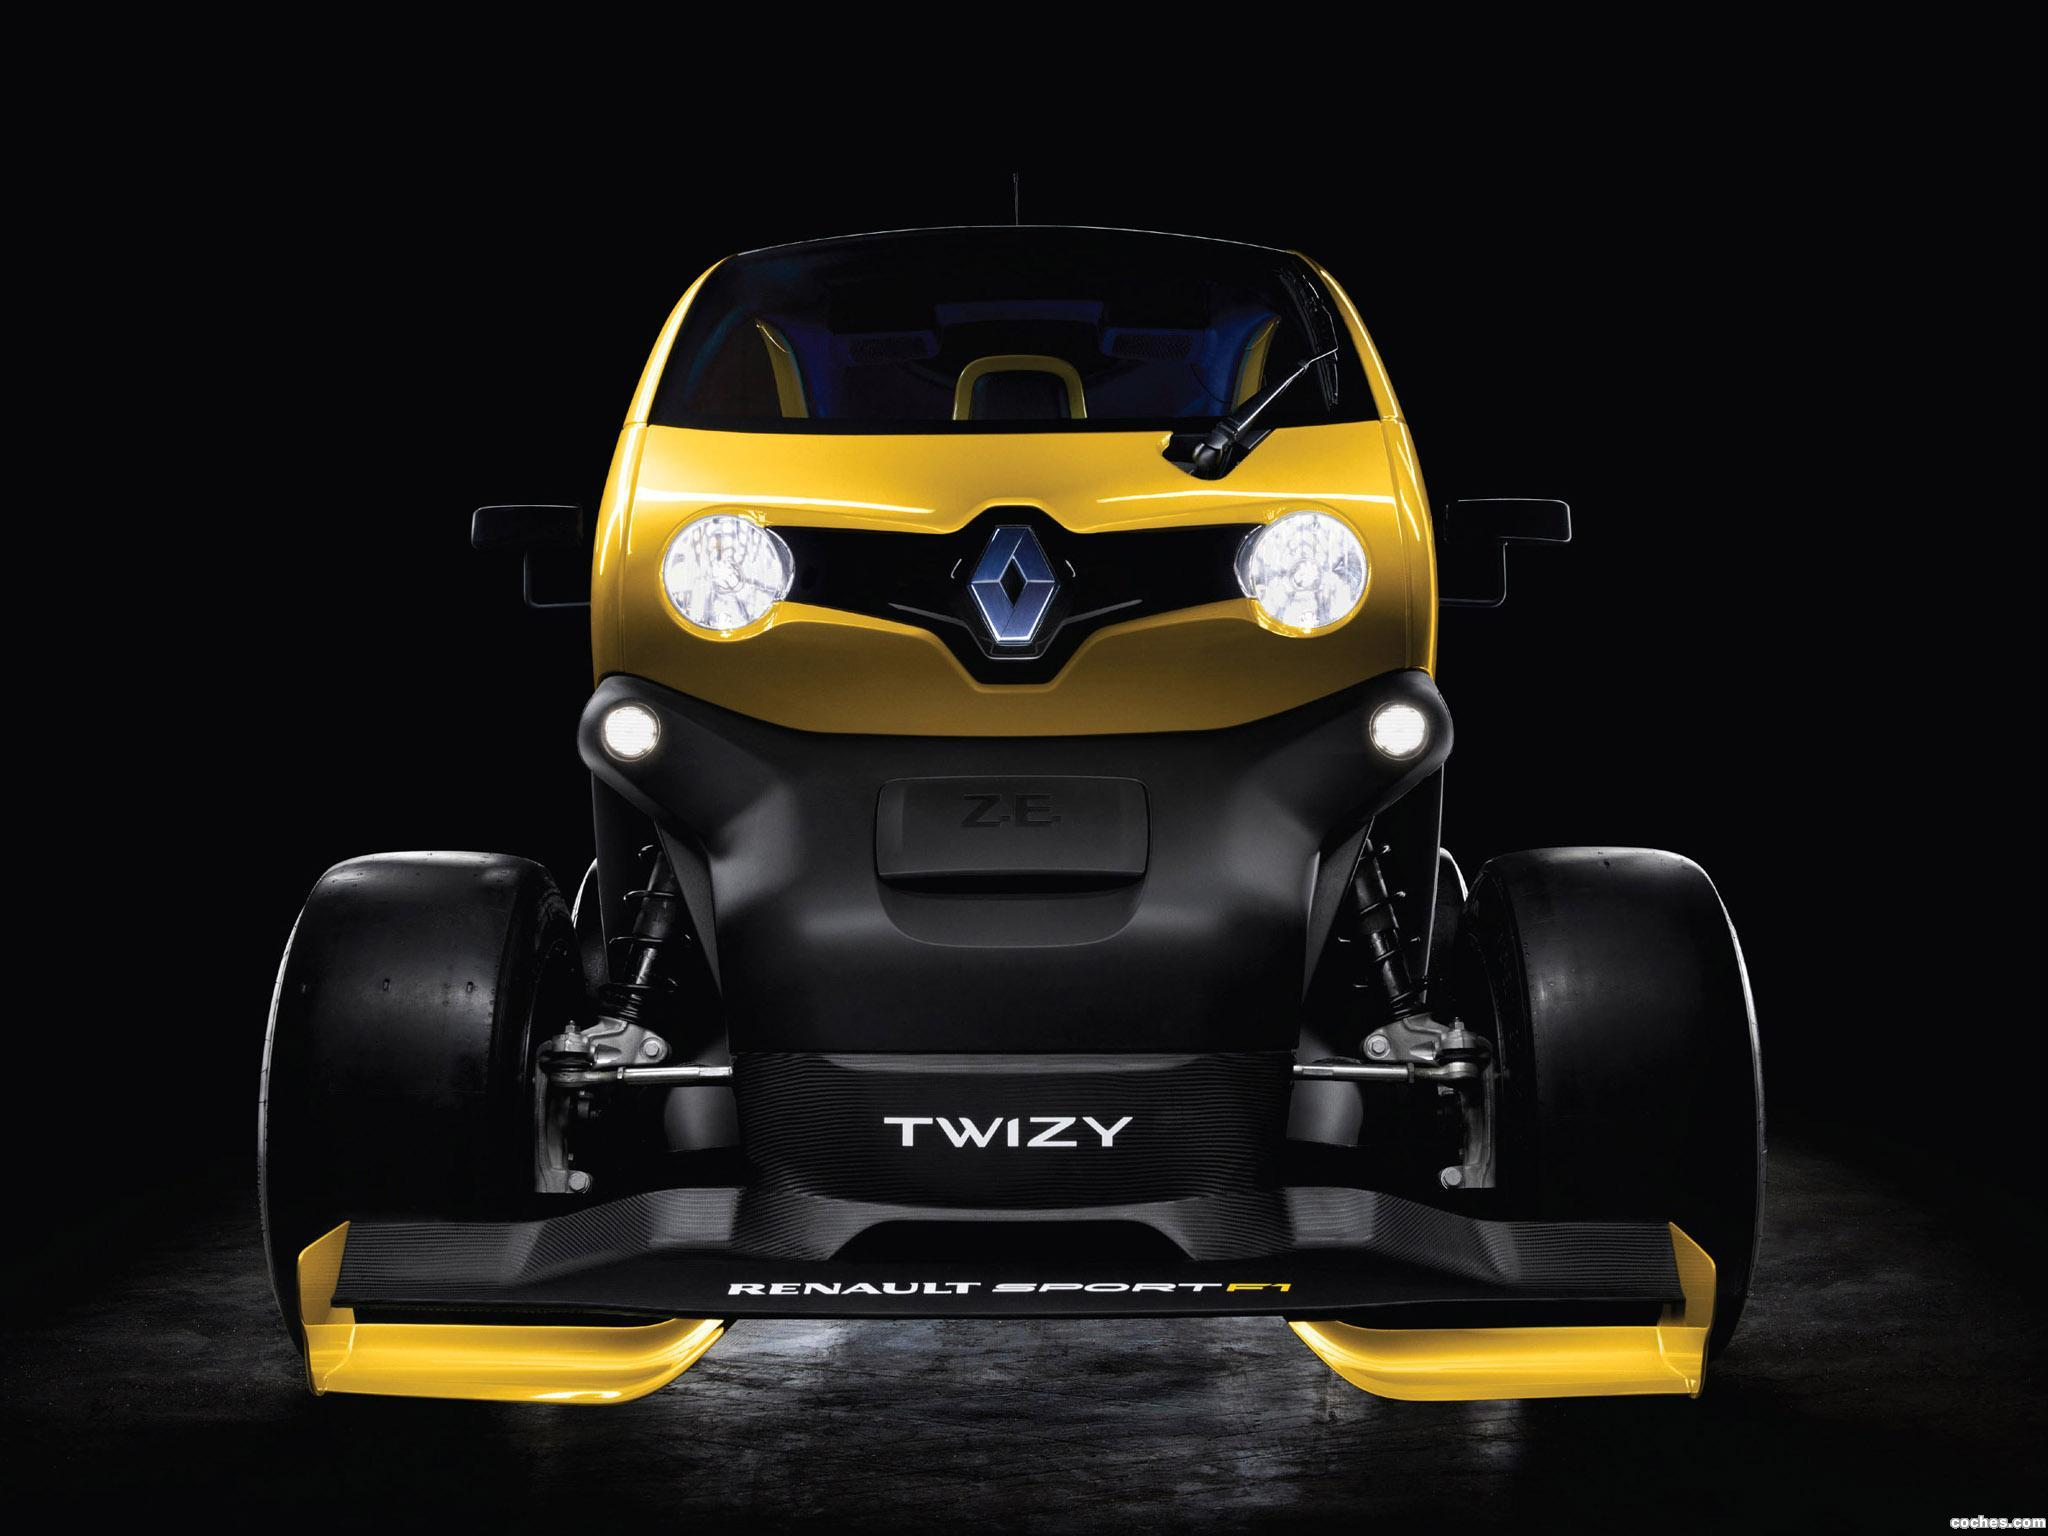 renault_twizy-z-e-rs-f1-concept-2013_r5